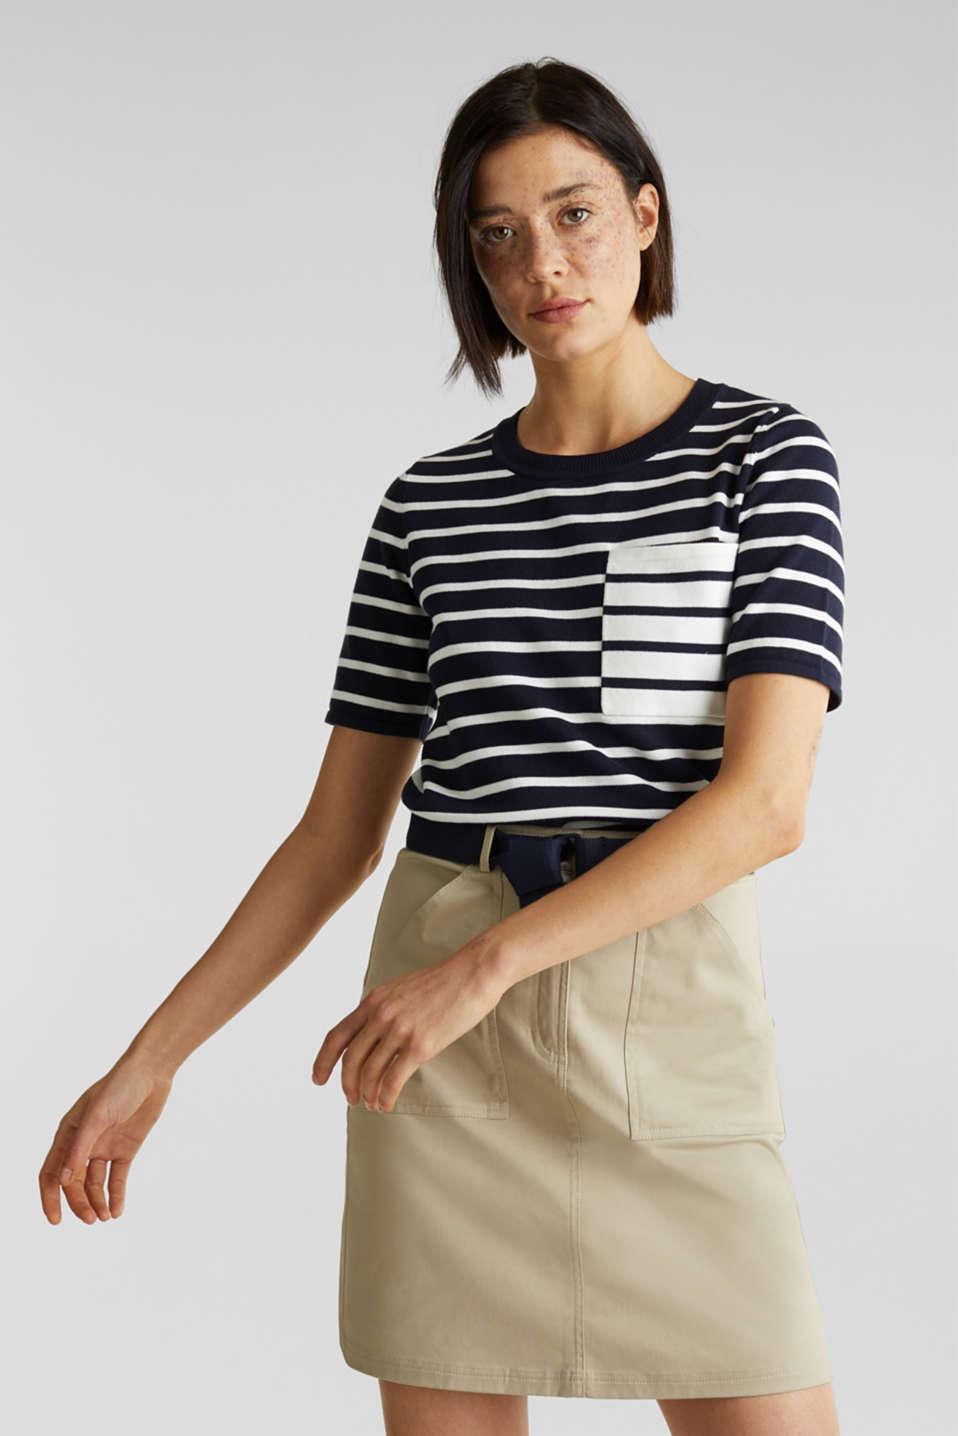 Short-sleeved jumper with a breast pocket, NAVY, detail image number 0